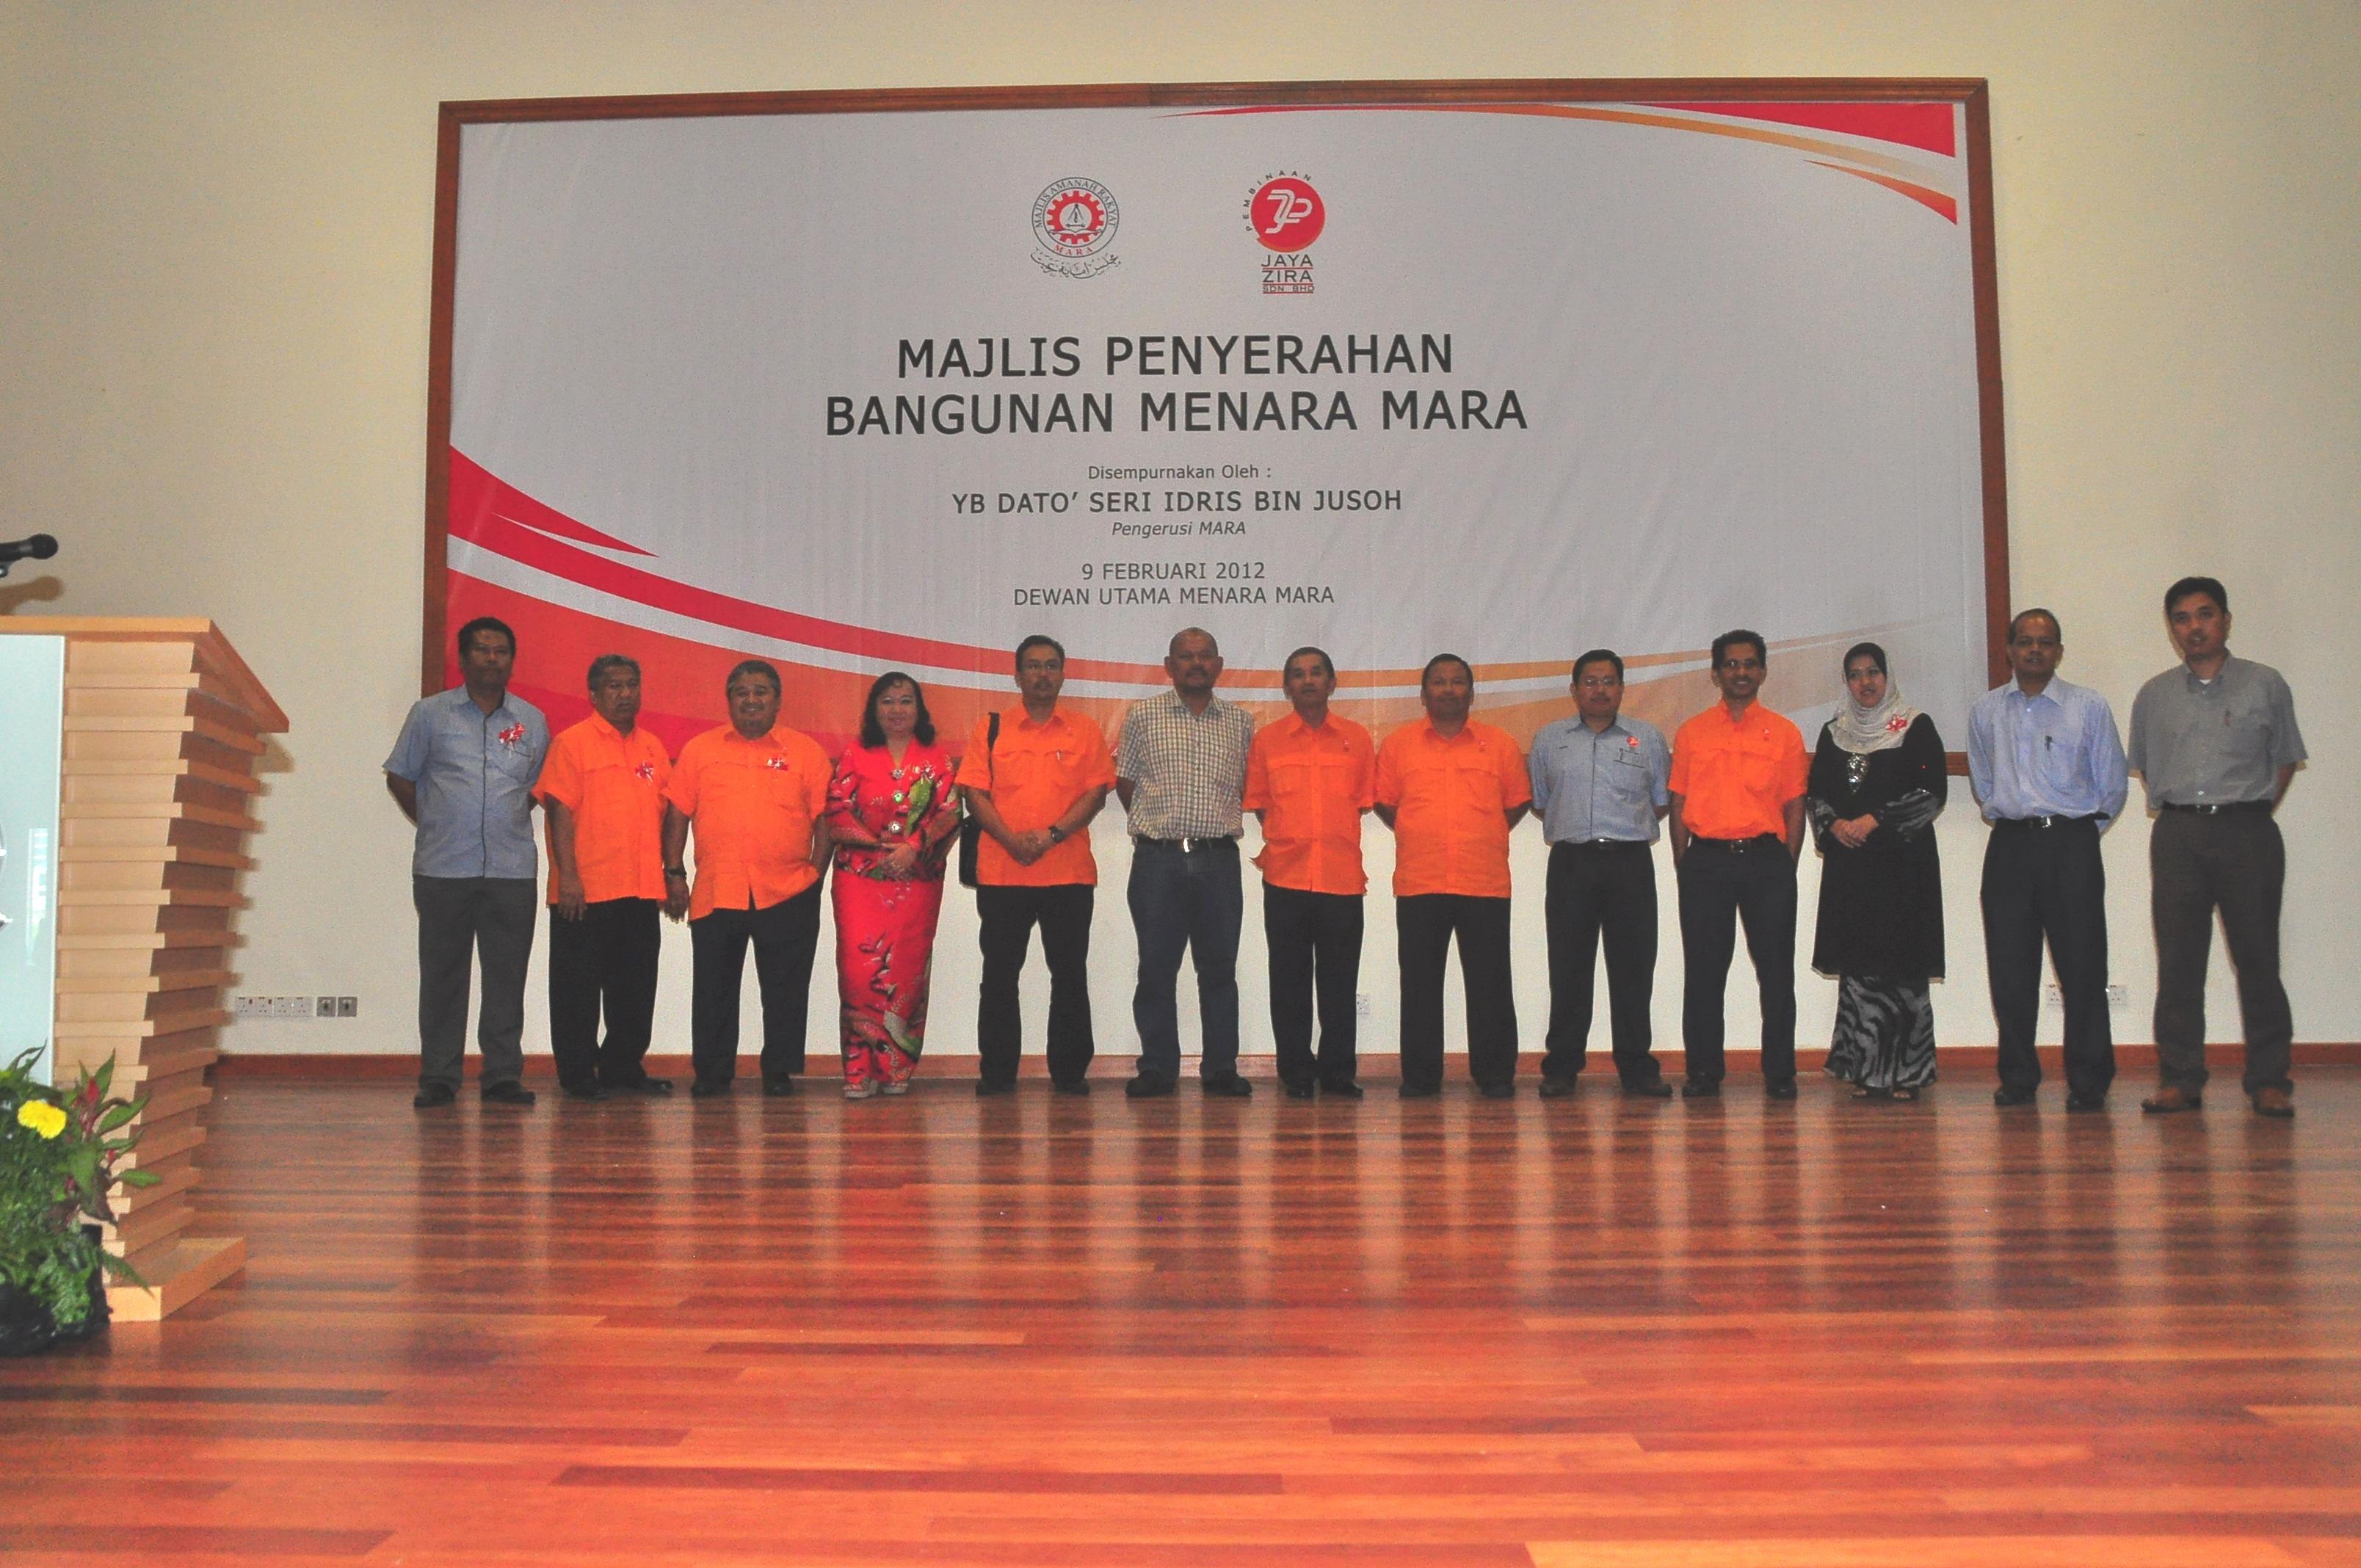 Pembinaan Jaya Zira Sdn Bhd Management Team